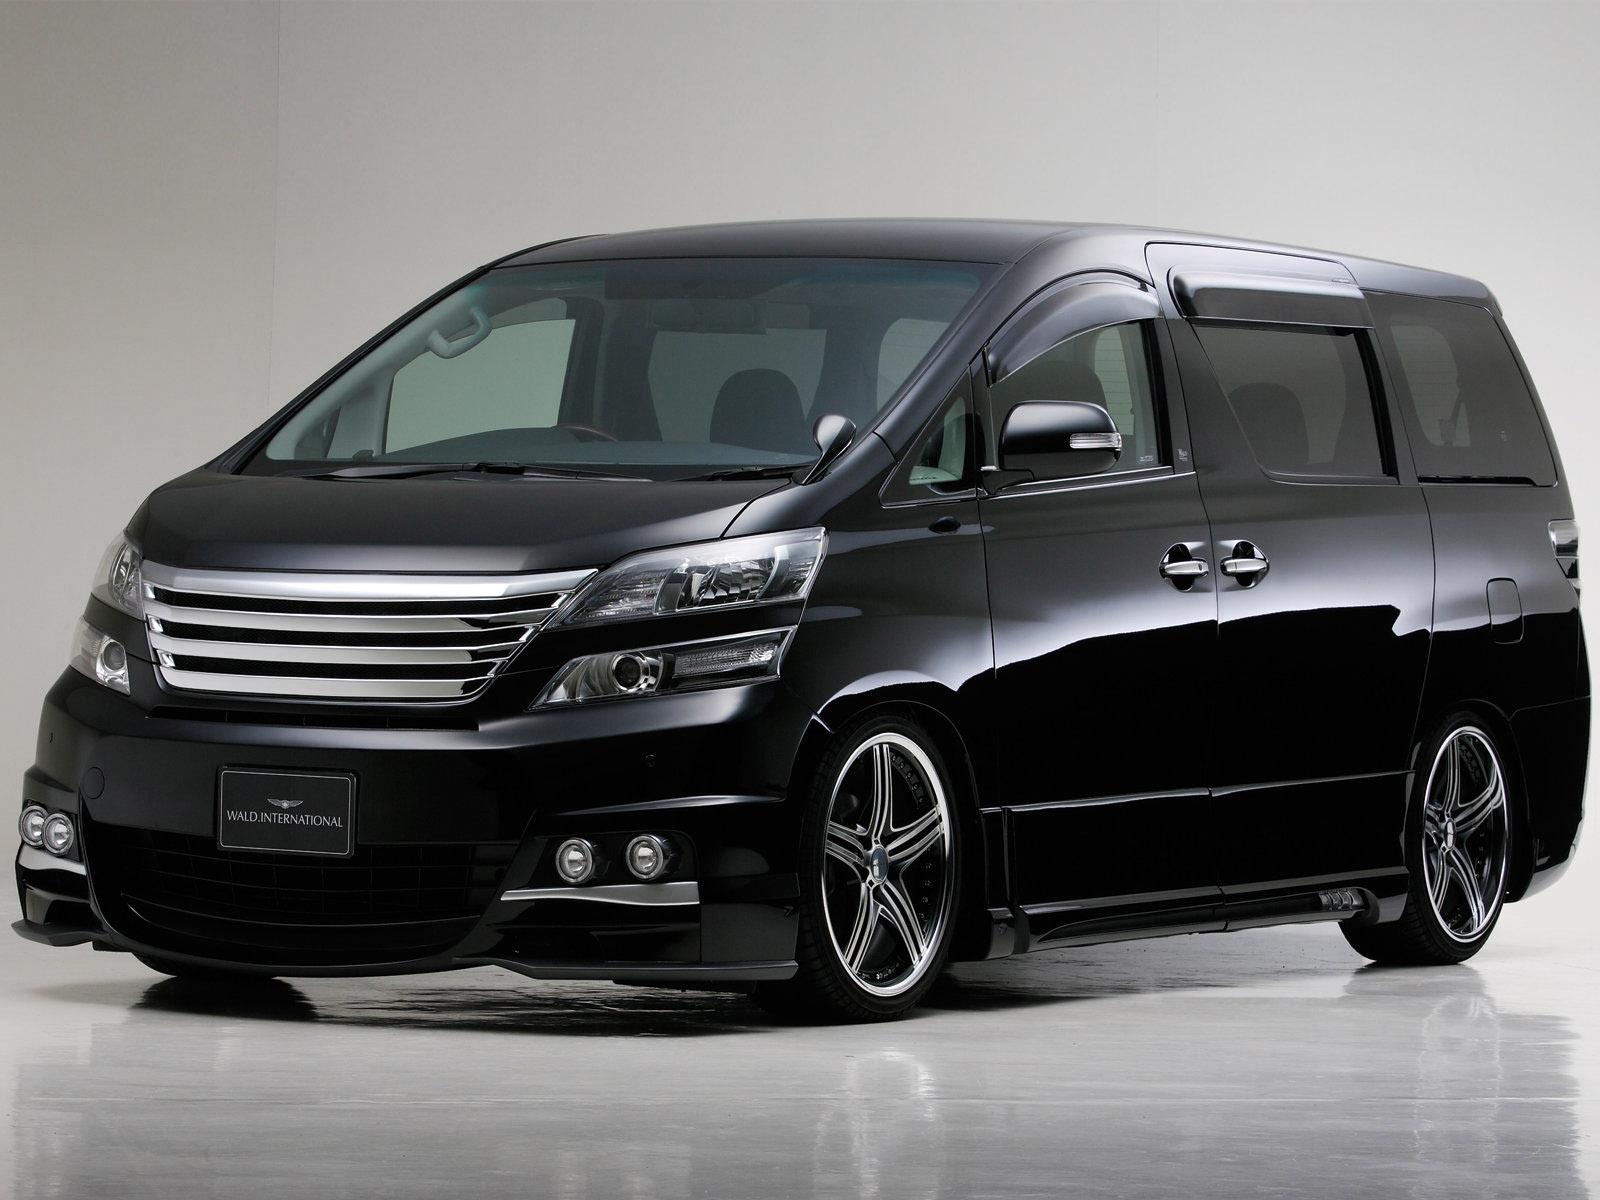 New Cars Toyota Vellfire The Power Luxury Cars